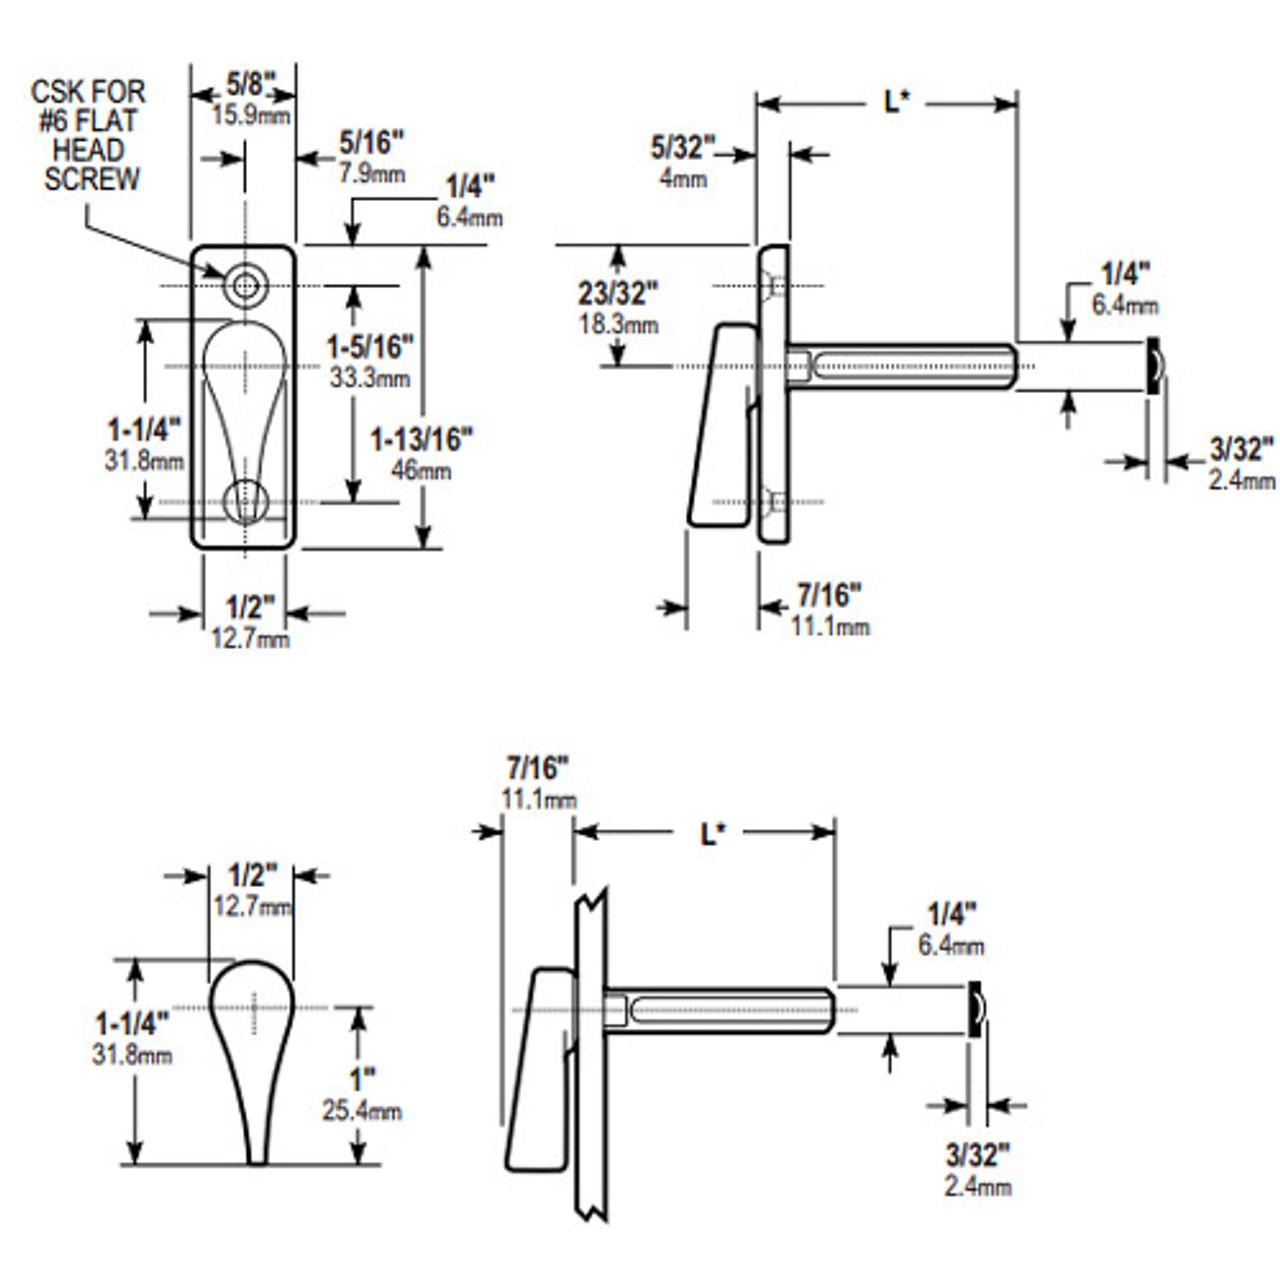 1000-21-30-119 Adams Rite 1000 Series Turns Dimensional View